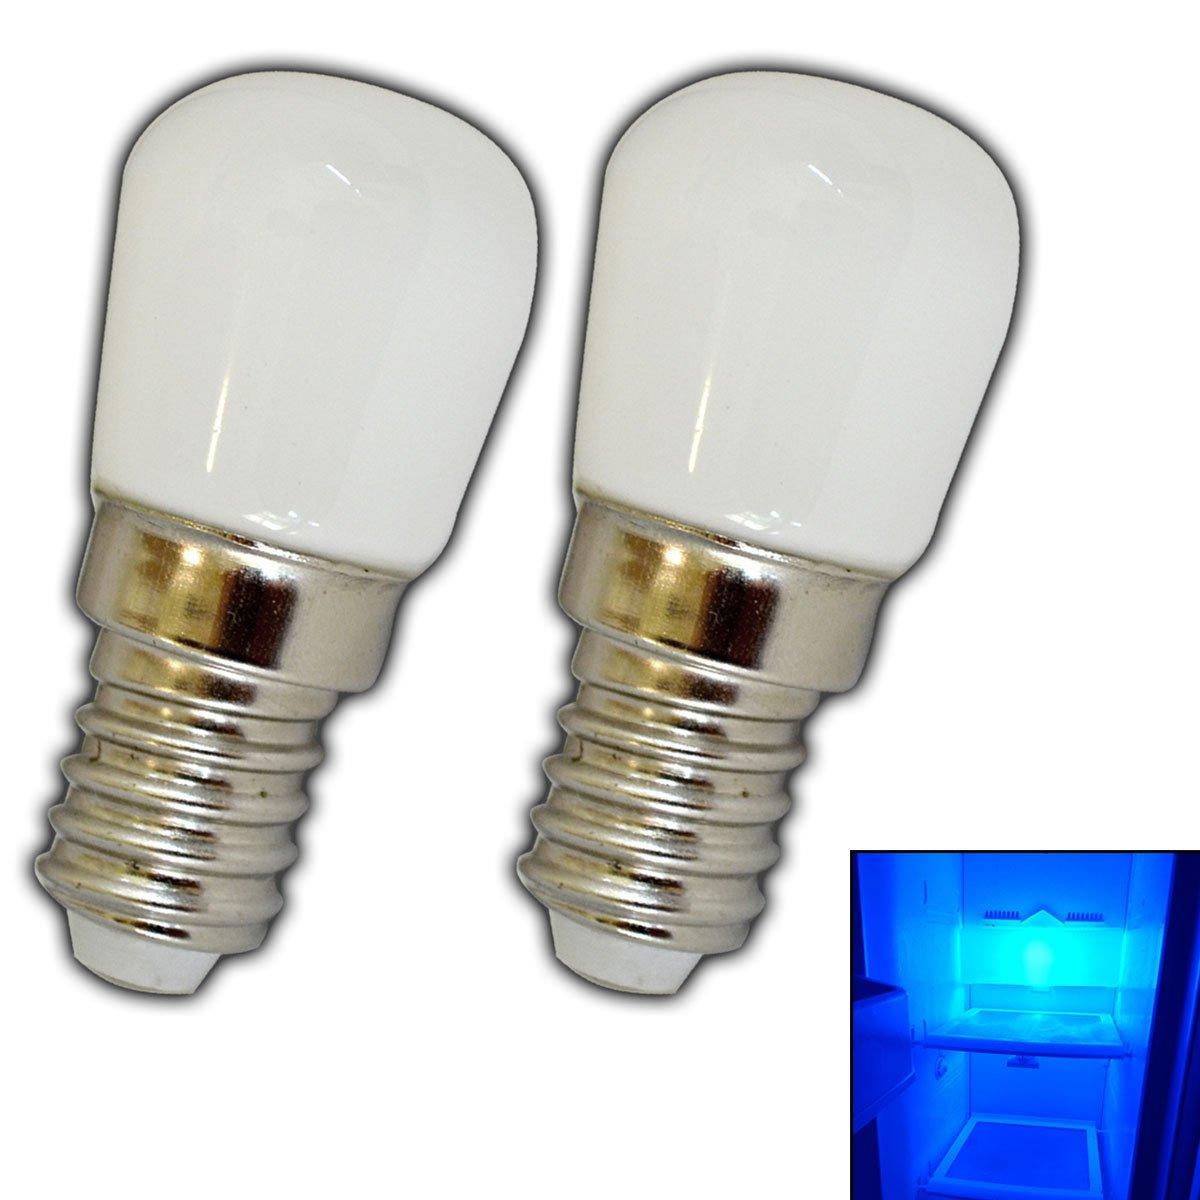 2x e14 led bulb 15 watt blueblue light for refrigerator lamps 2x e14 led bulb 15 watt blueblue light for refrigerator lamps etc e14ses fridge bulb replacement amazon lighting parisarafo Images